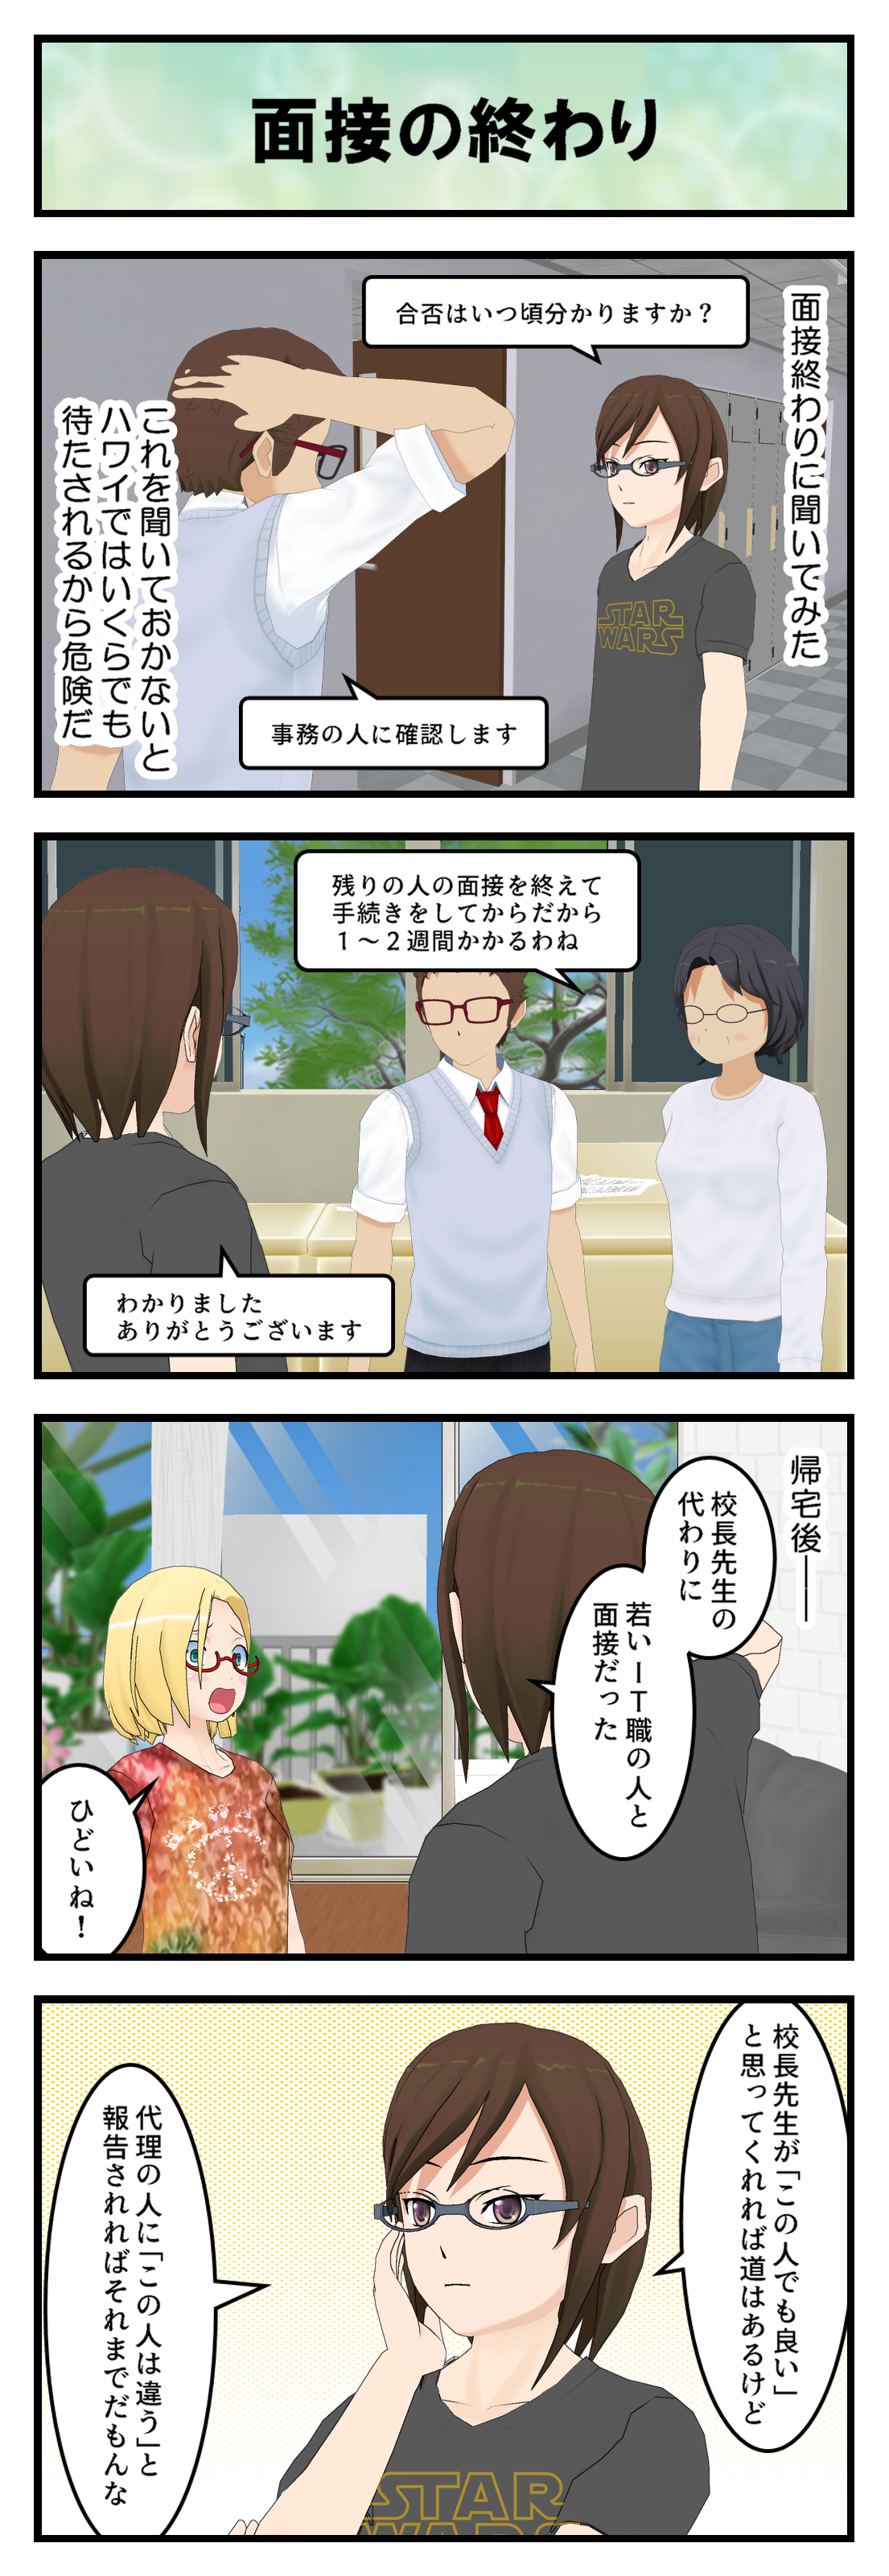 R486_高校6面接終わり_001